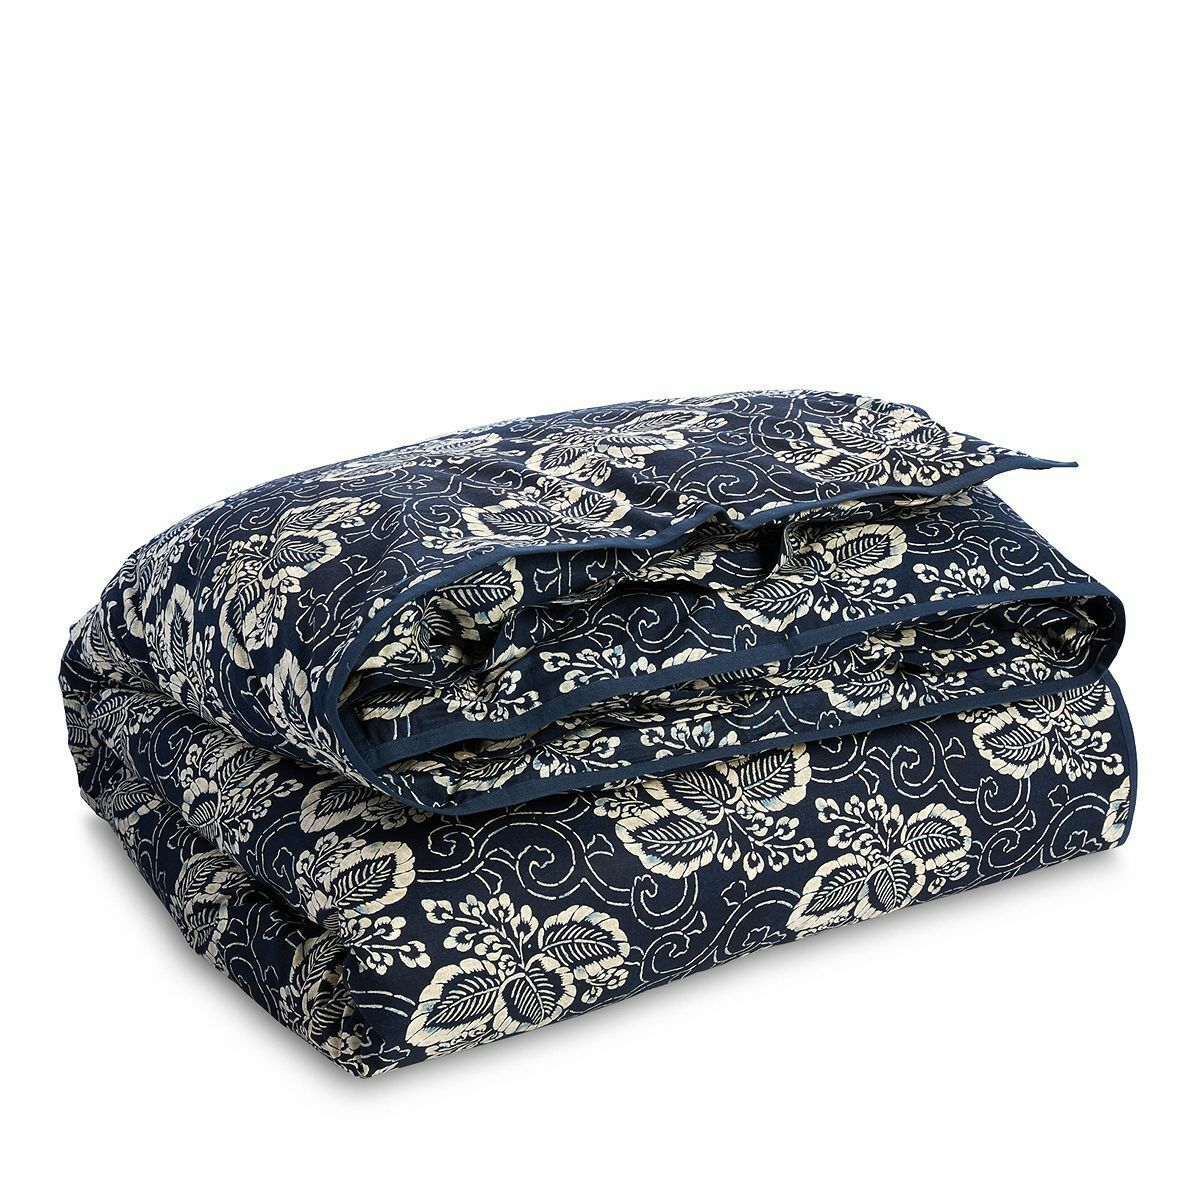 Ralph Lauren Home Durant Kira Floral KING Duvet Cover blueee  Multi Cotton  430